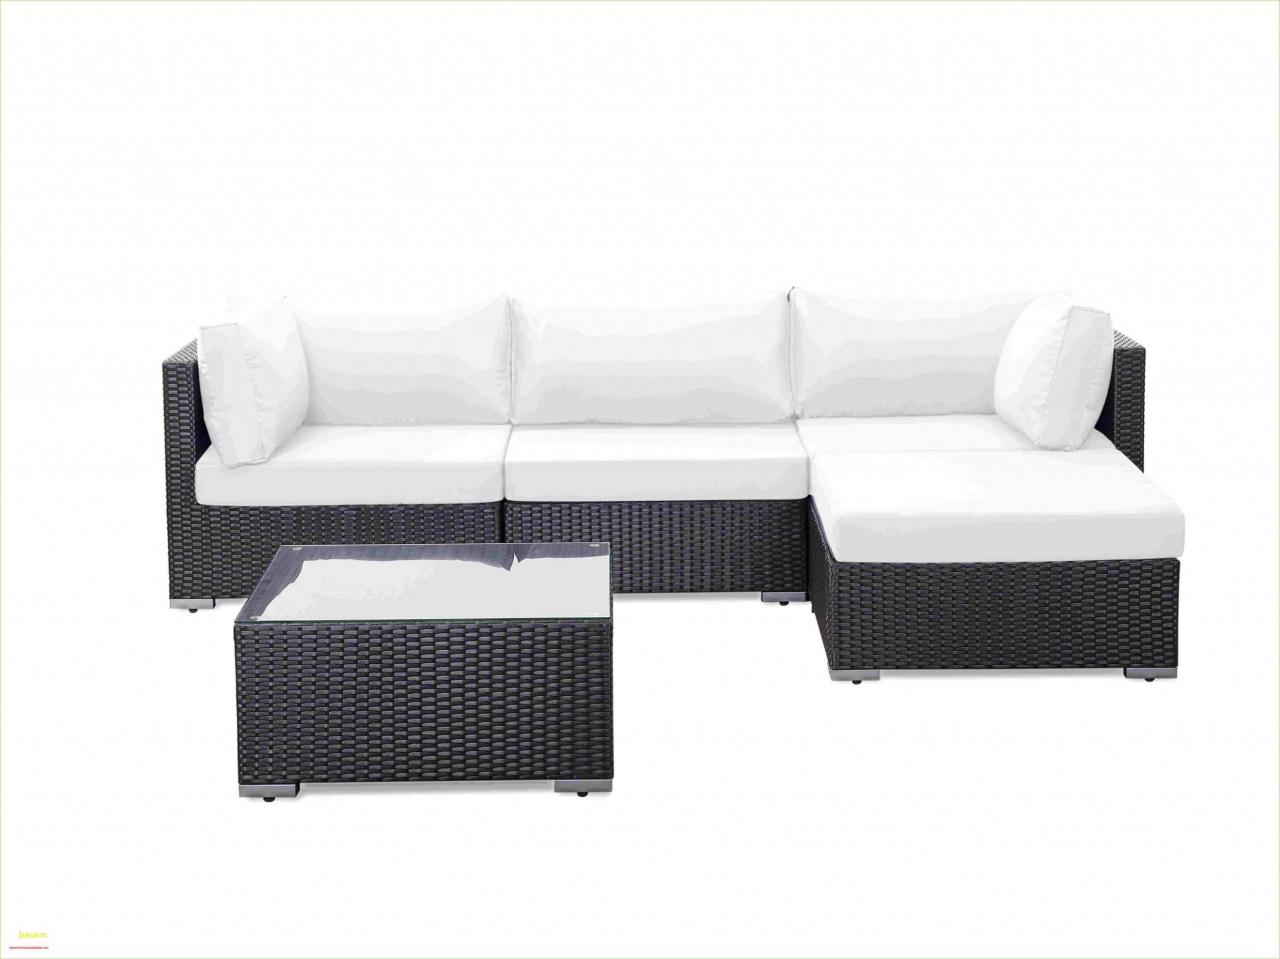 Couch Garten Genial Cheap Patio Chairs Garten Sale Neu Lounge Outdoor